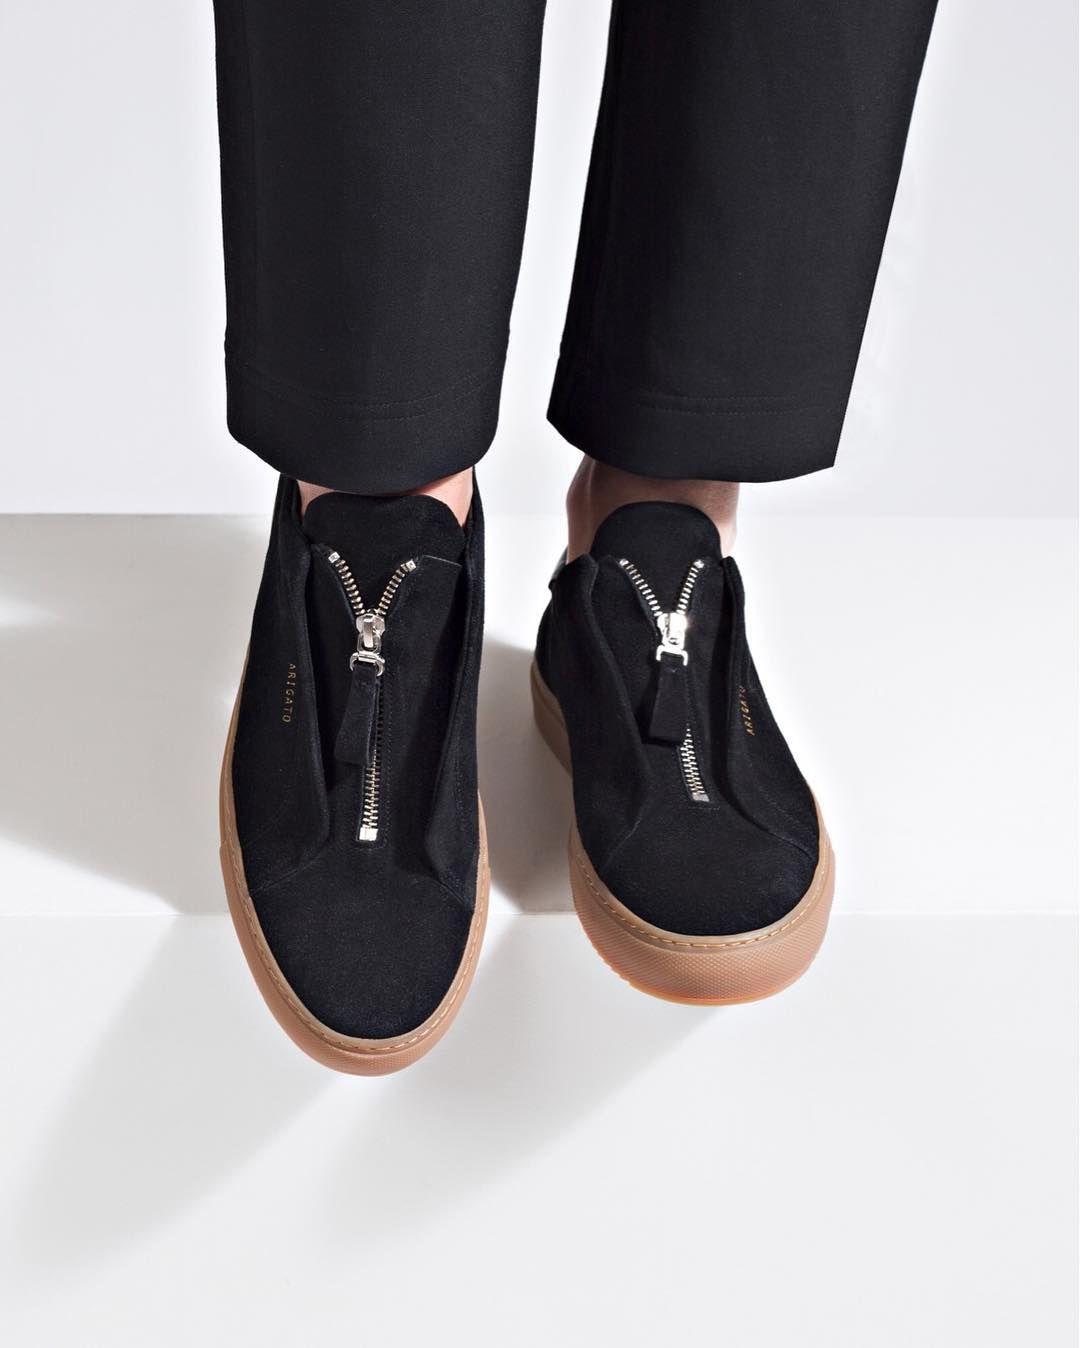 Axel Arigato Clean 90 Zip   www.axelarigato.com    axelarigato  shoes   sneakers  suede  handcrafted d810993abee9